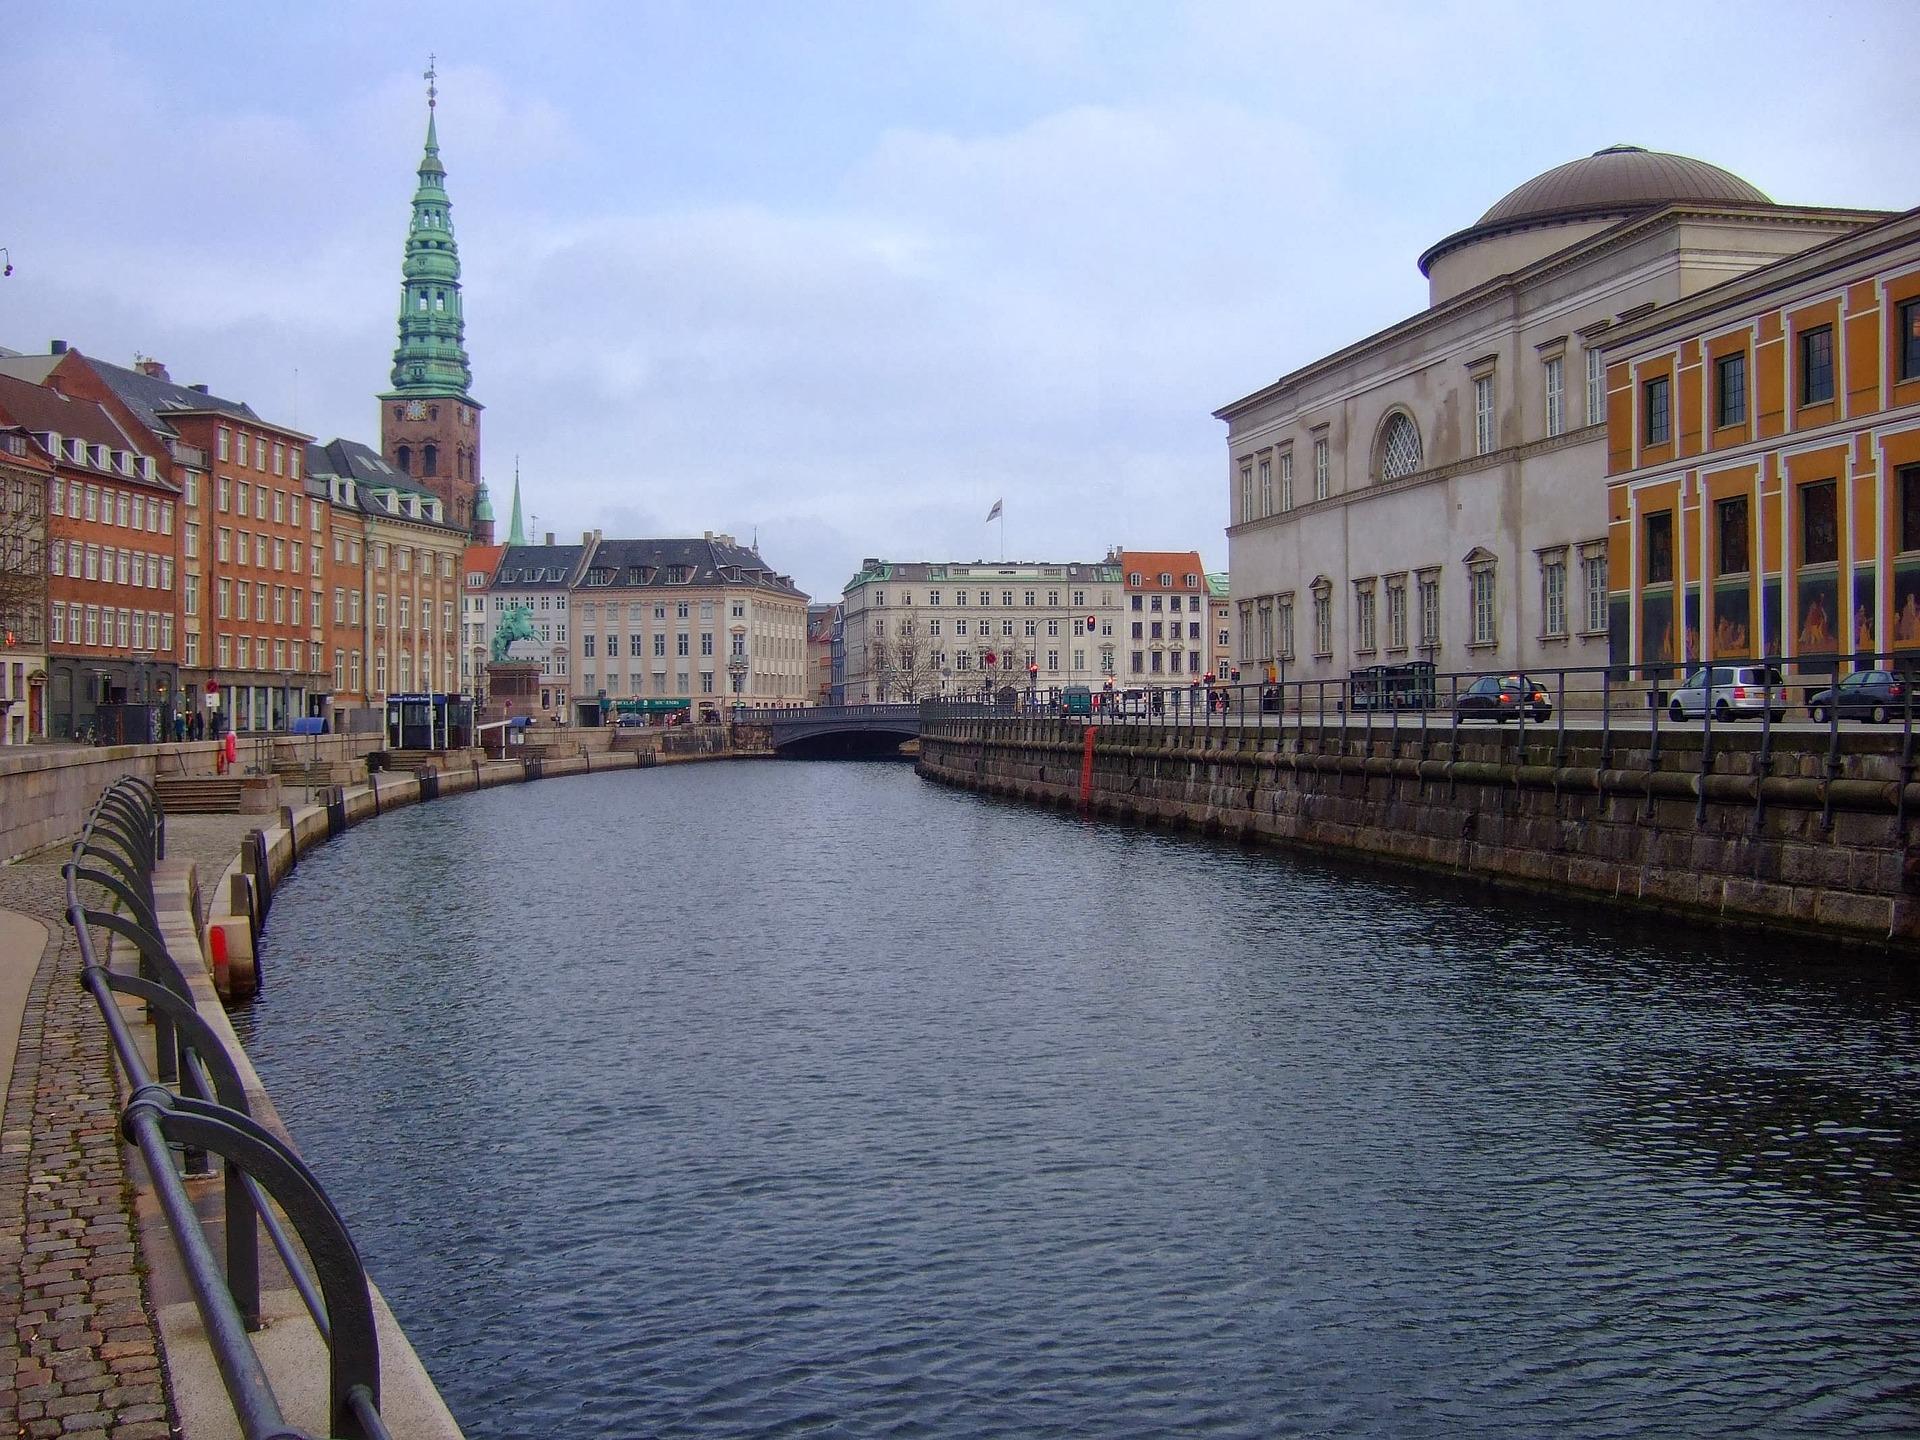 Canal in Nyhavn, Copenhagen, Denmark